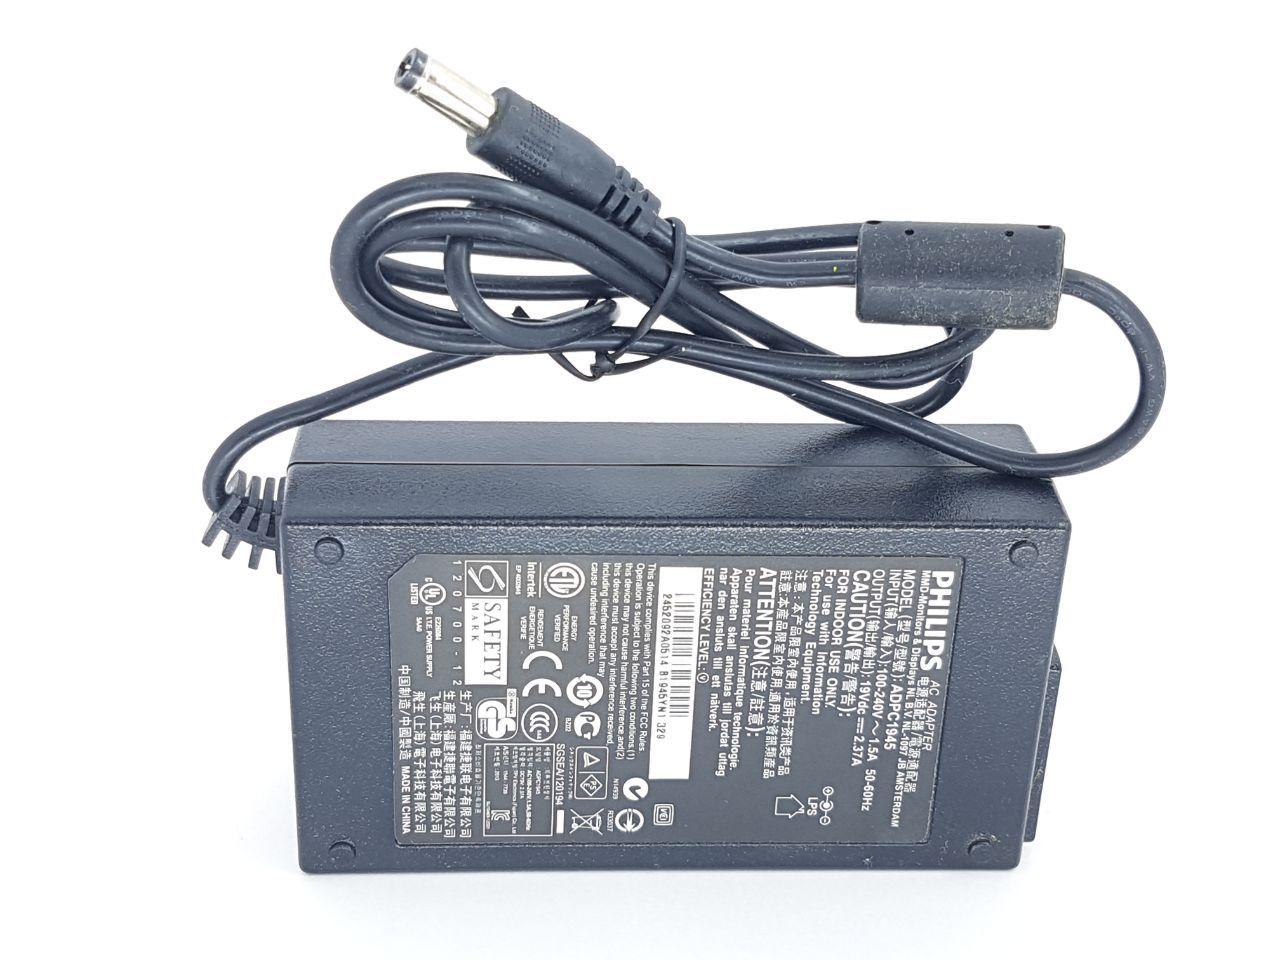 Fonte Para Monitor Philips Led Adpc 1945 19v X 2.37 Amp 45w